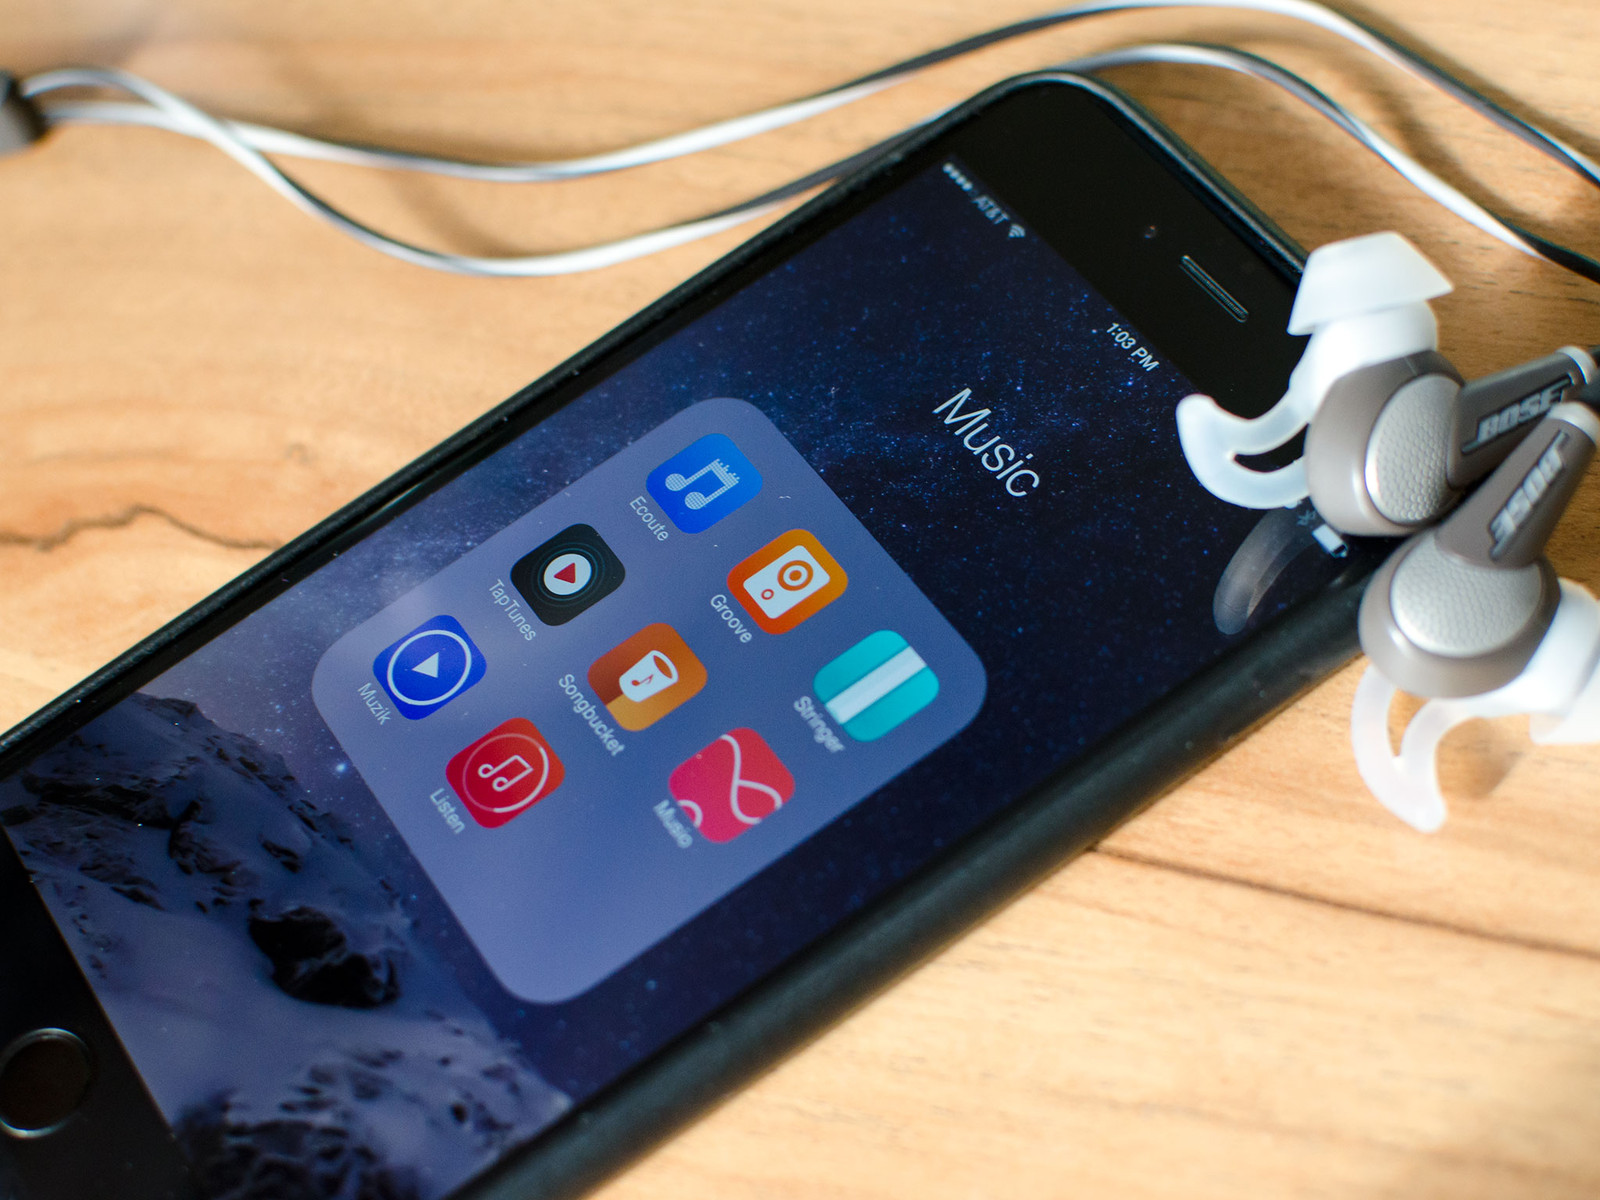 Cara Menghapus Semua Lagu di iPhone 3